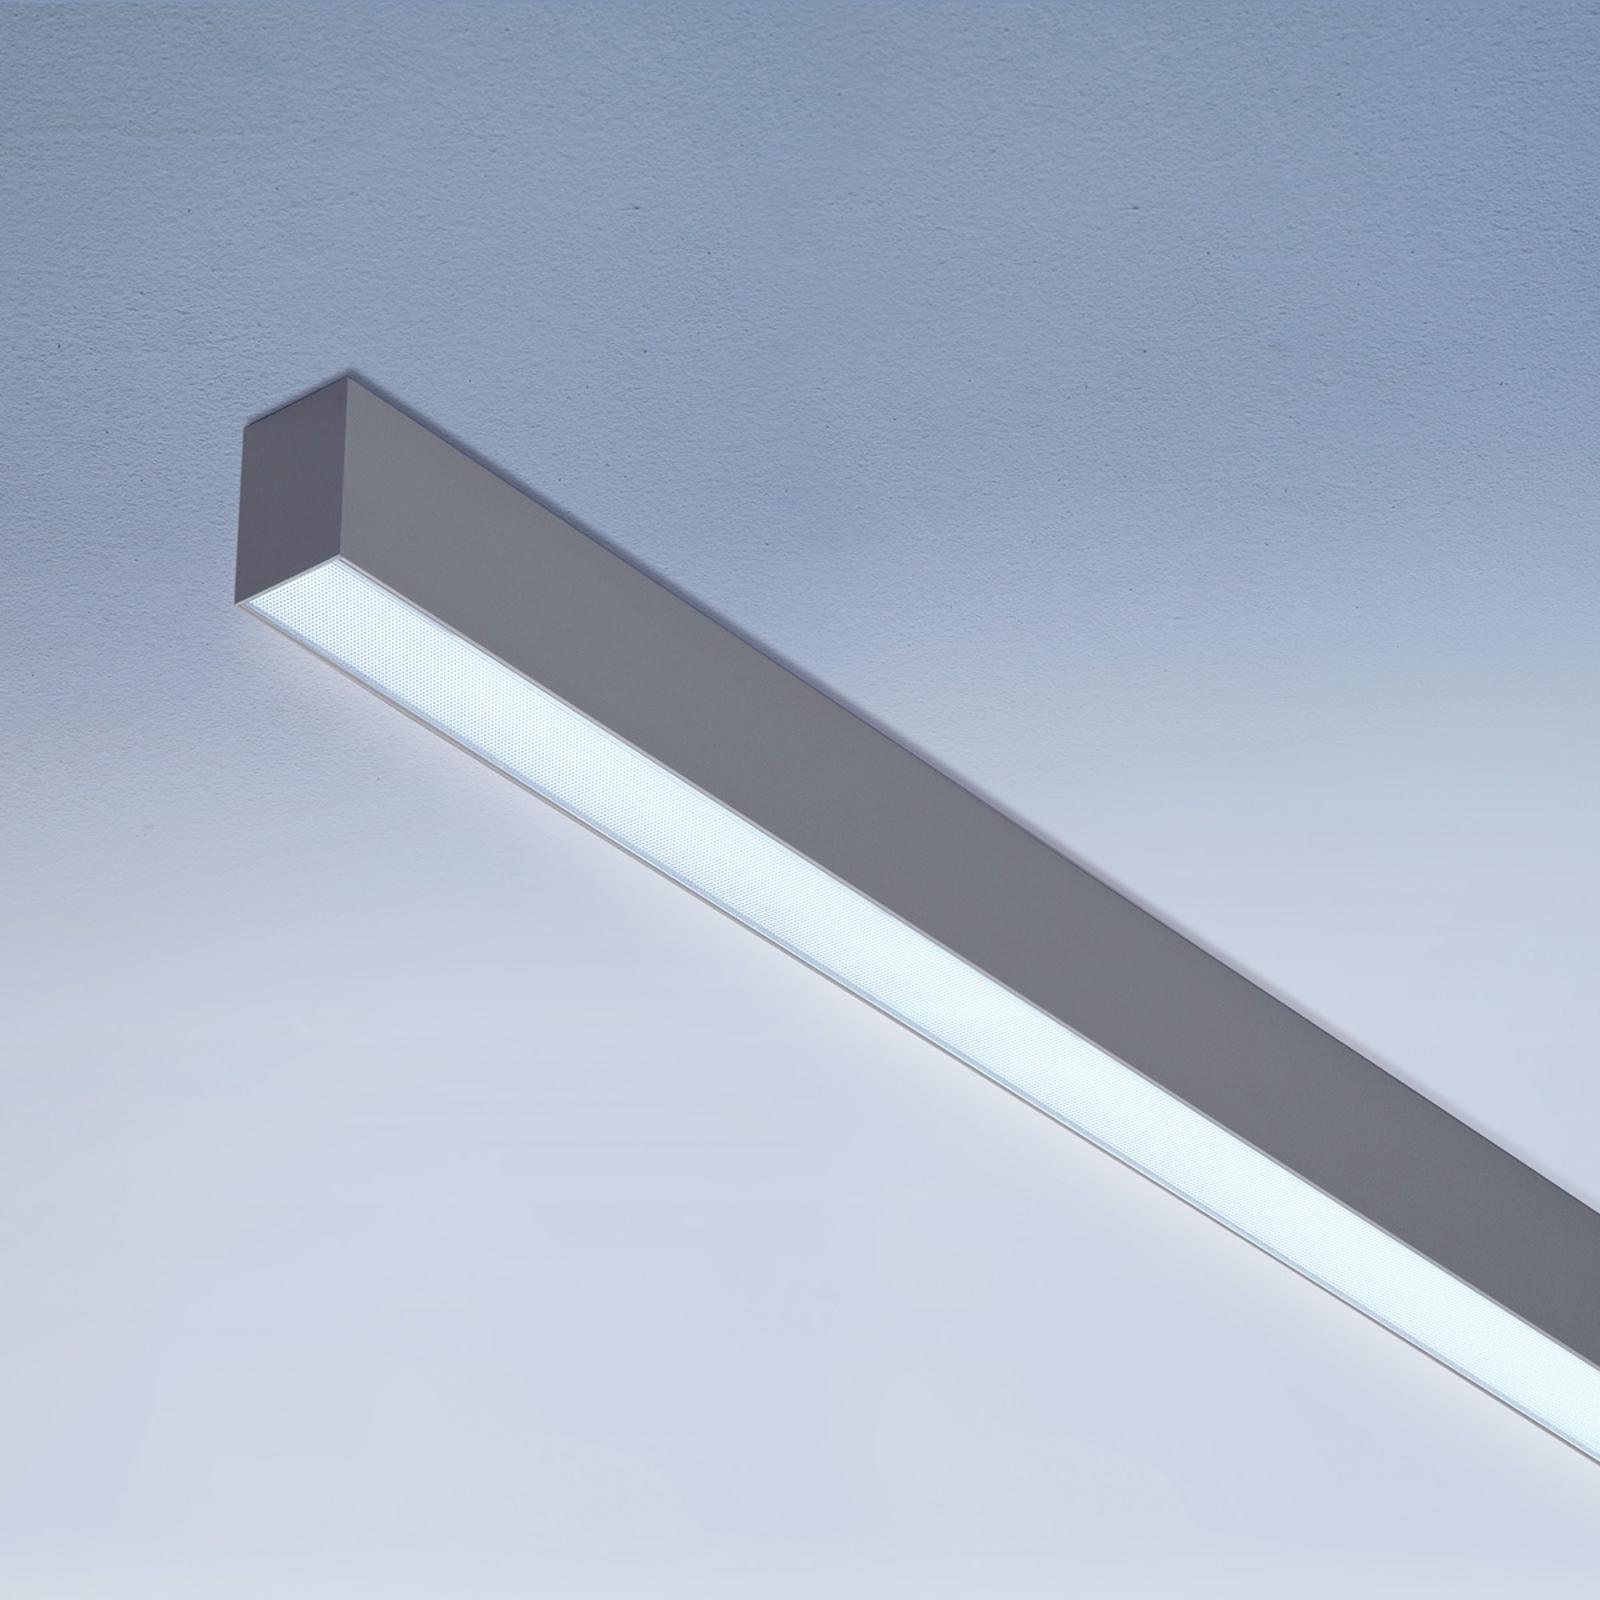 Medium Power - LED-Wandleuchte Matric-A3 176,5 cm